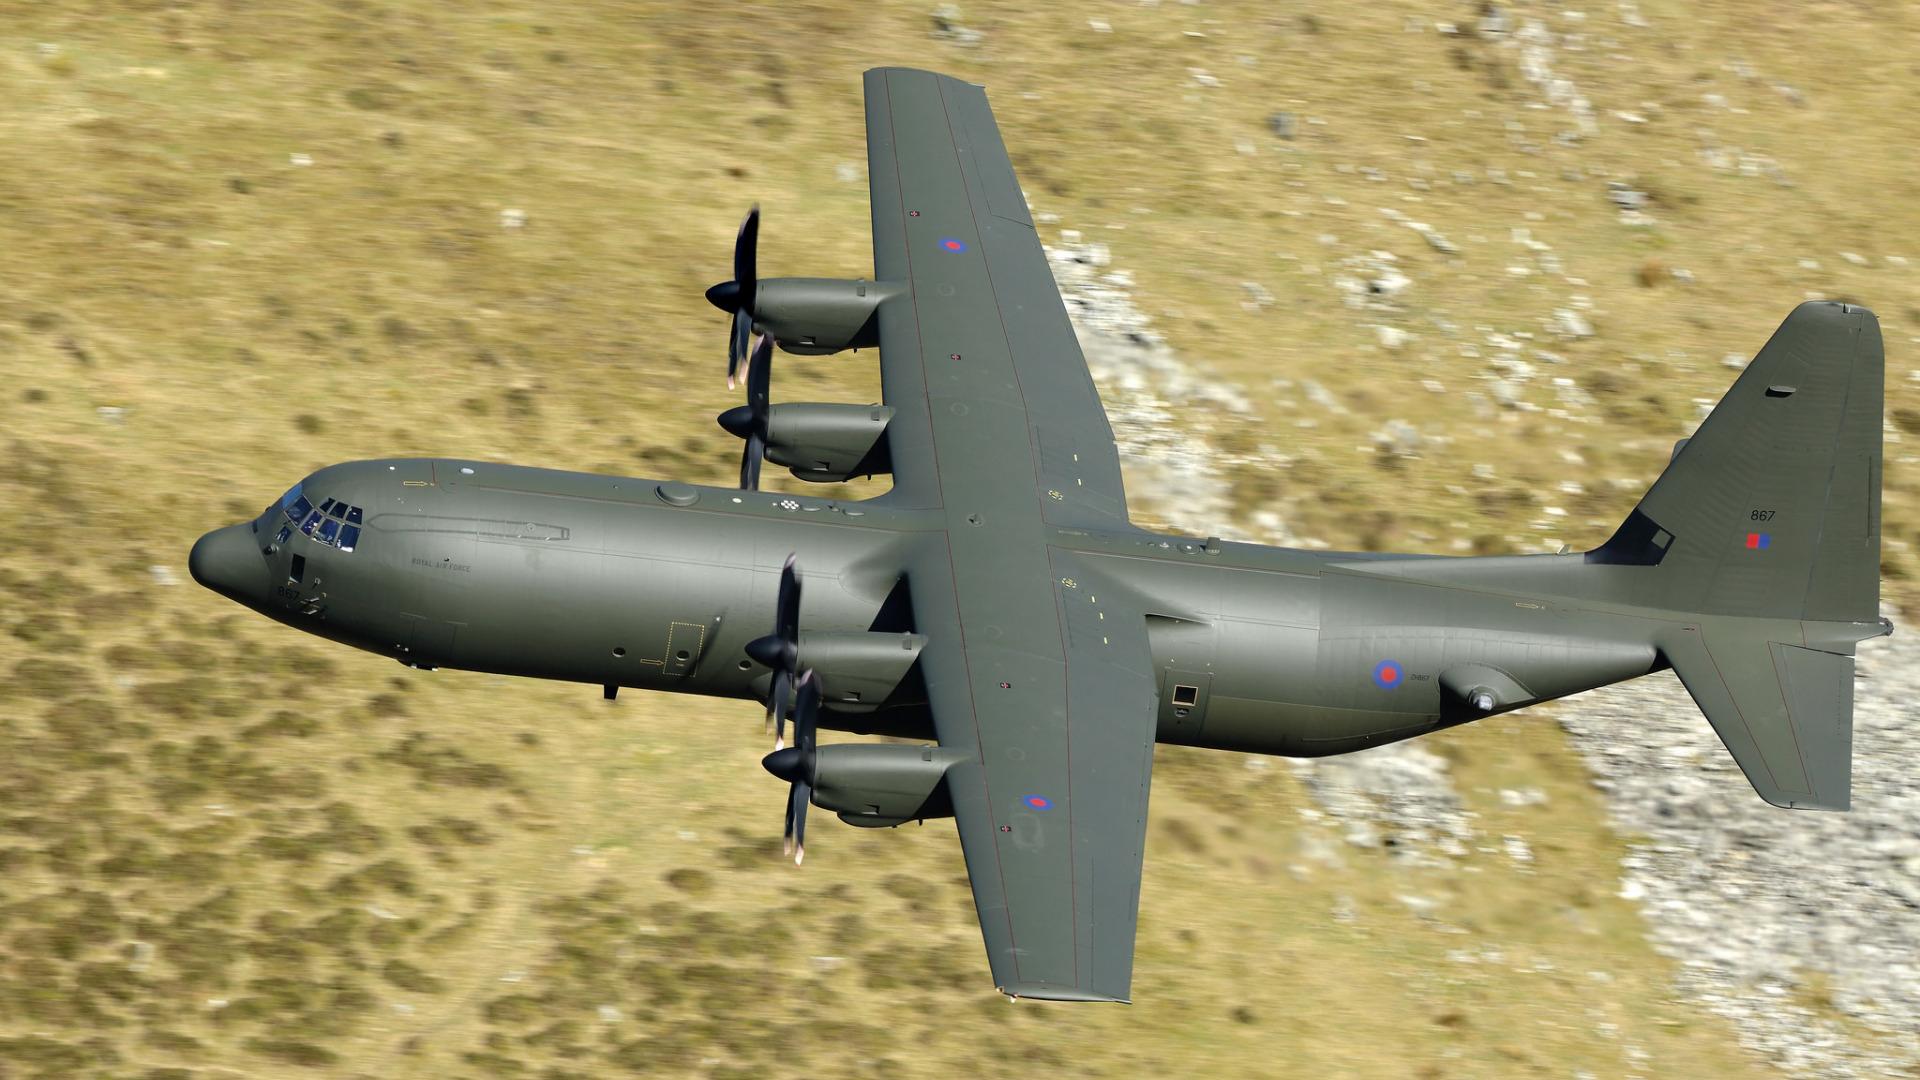 Lockheed C130 Hercules  Wikipedia